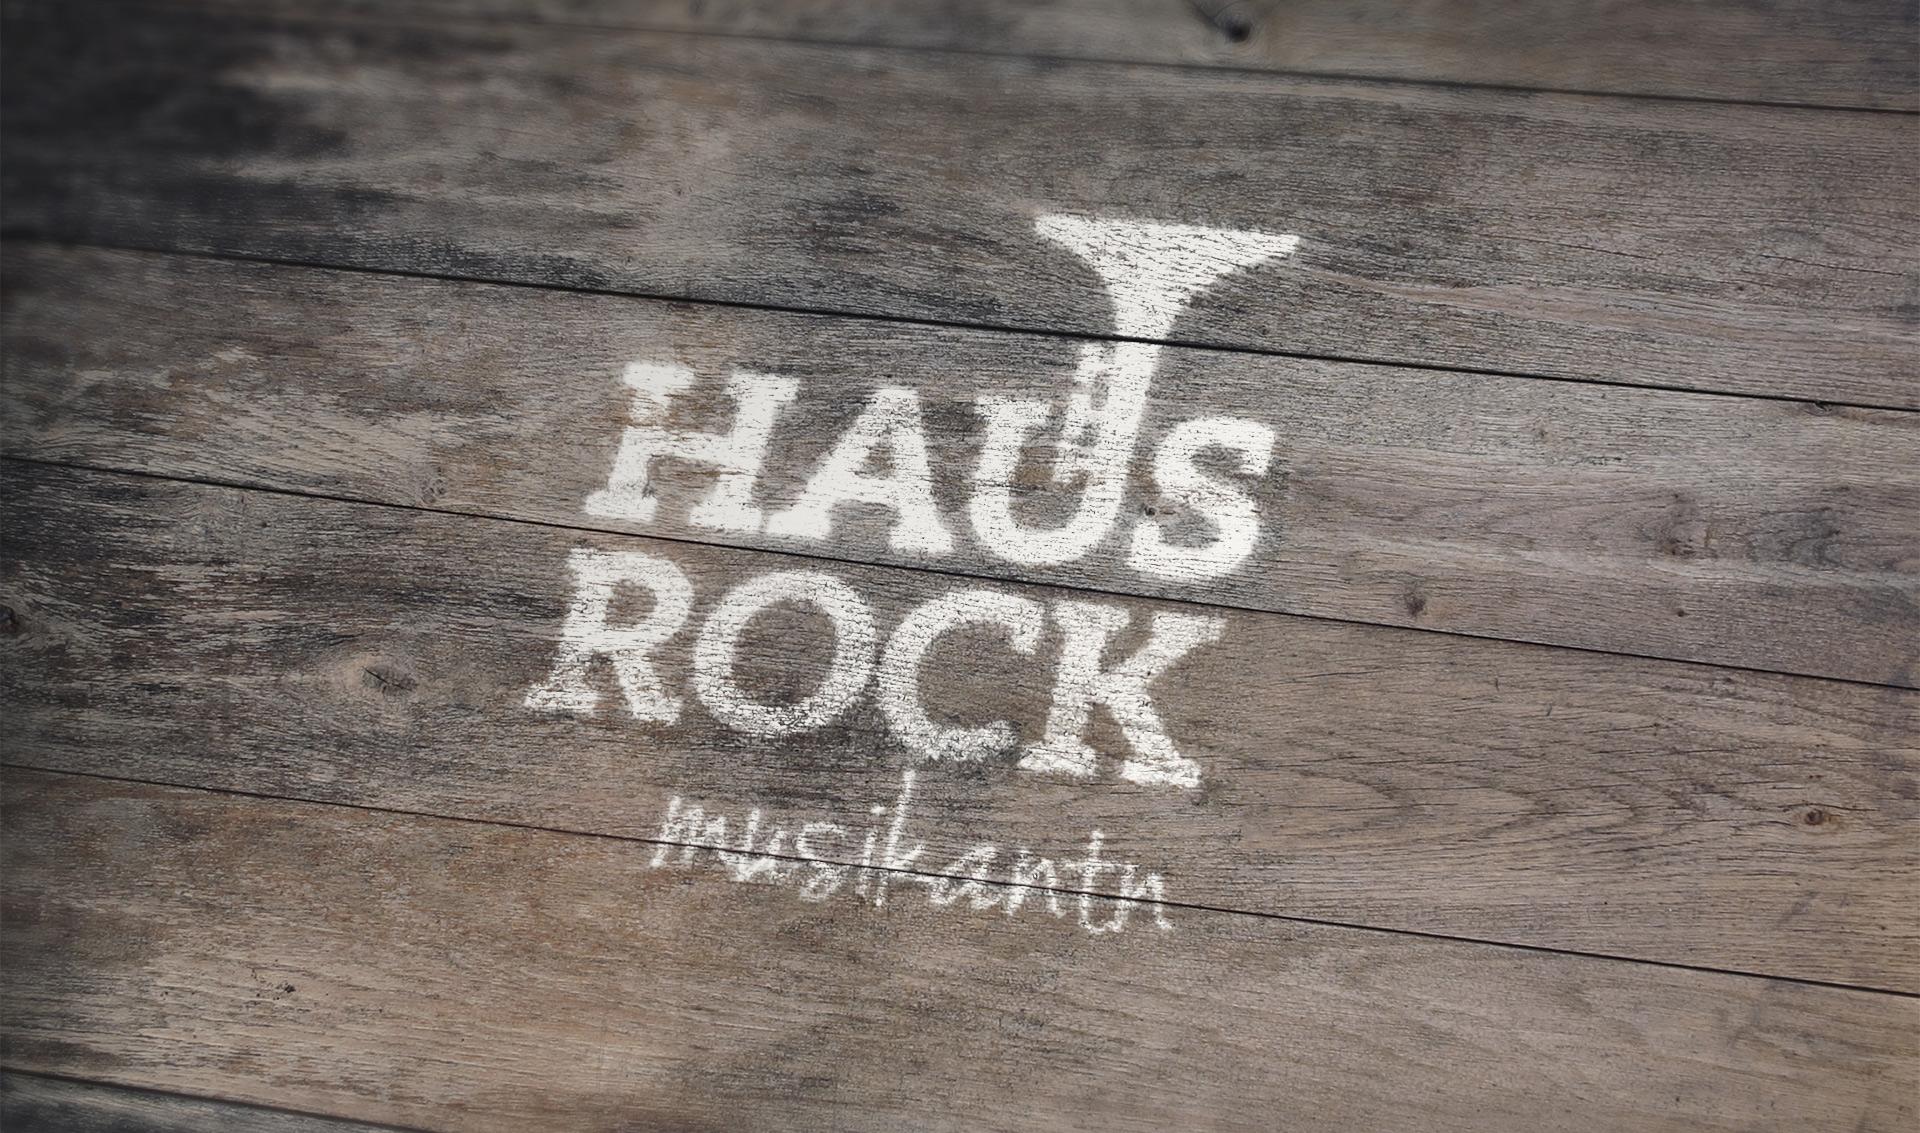 hausrock_paintedwood.jpg